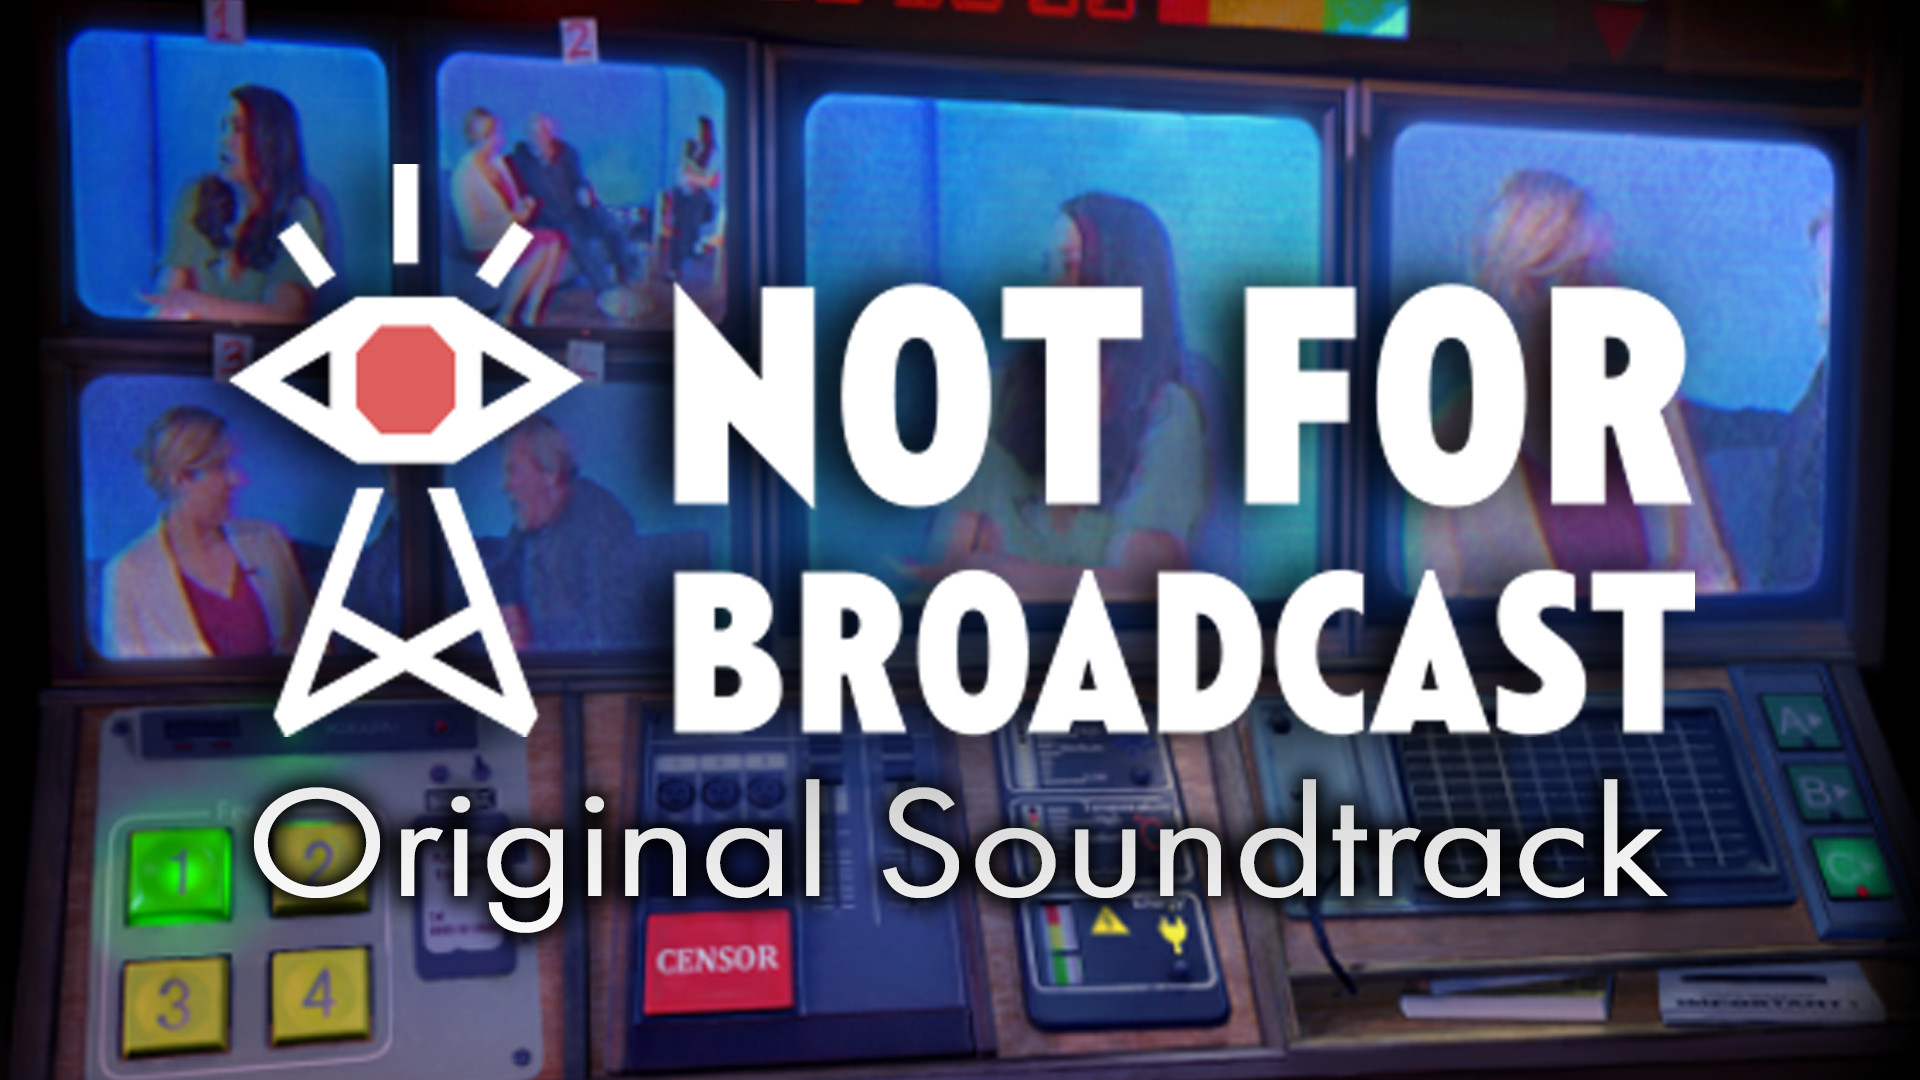 Not For Broadcast Original Soundtrack screenshot